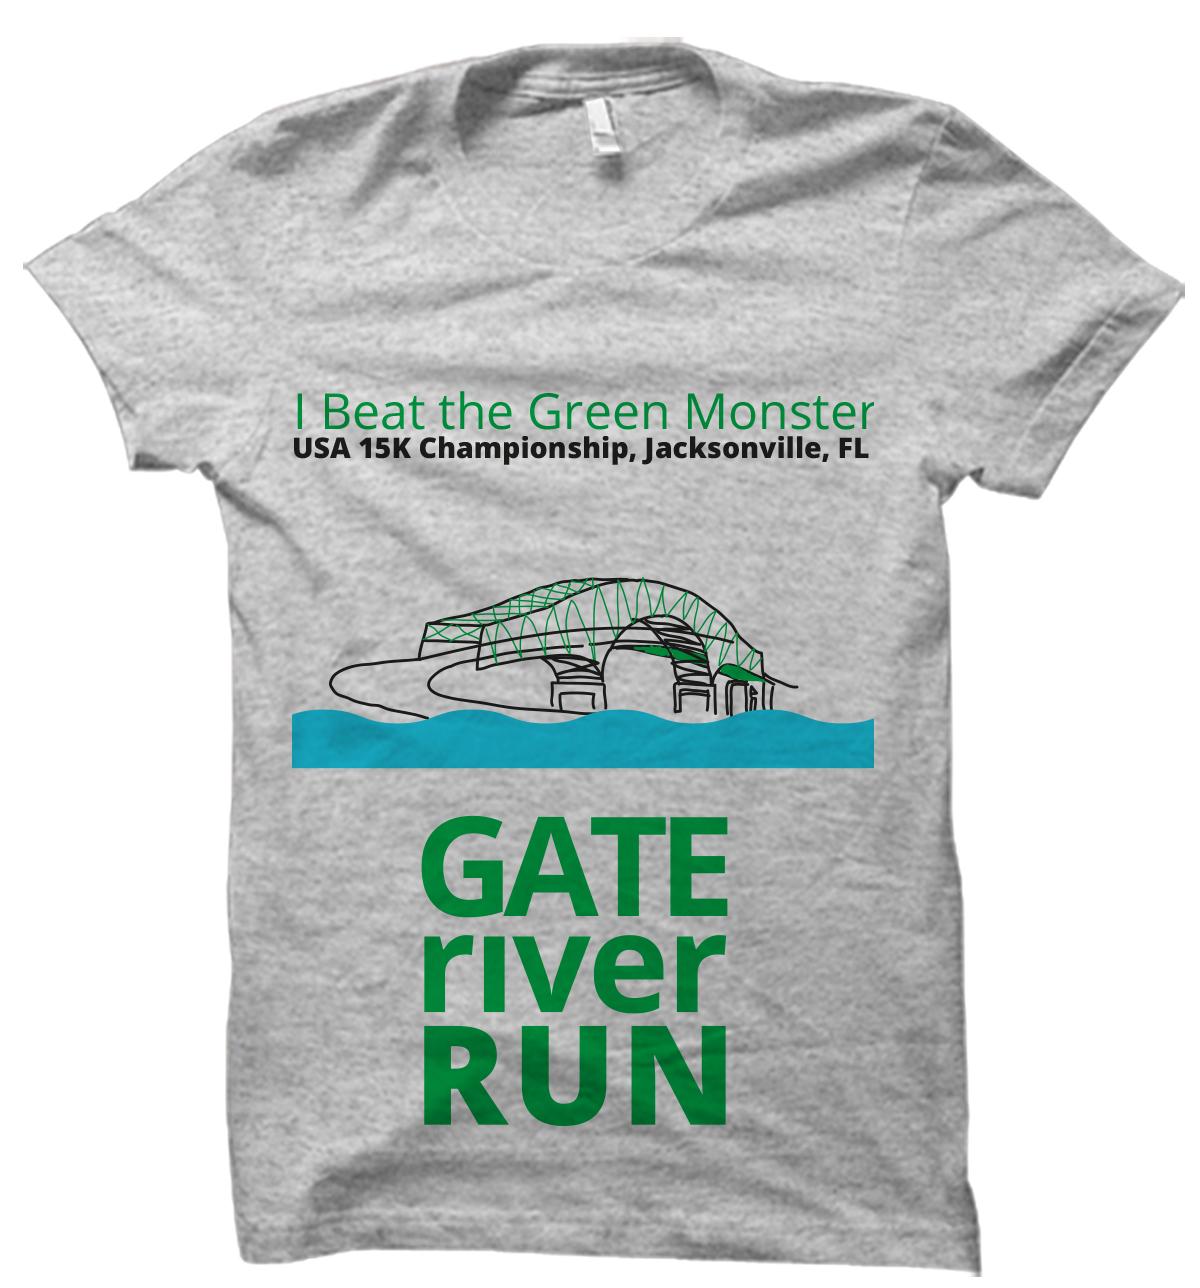 Shirt design jacksonville fl - Professional Modern T Shirt Design For Company In United States Design 6979184